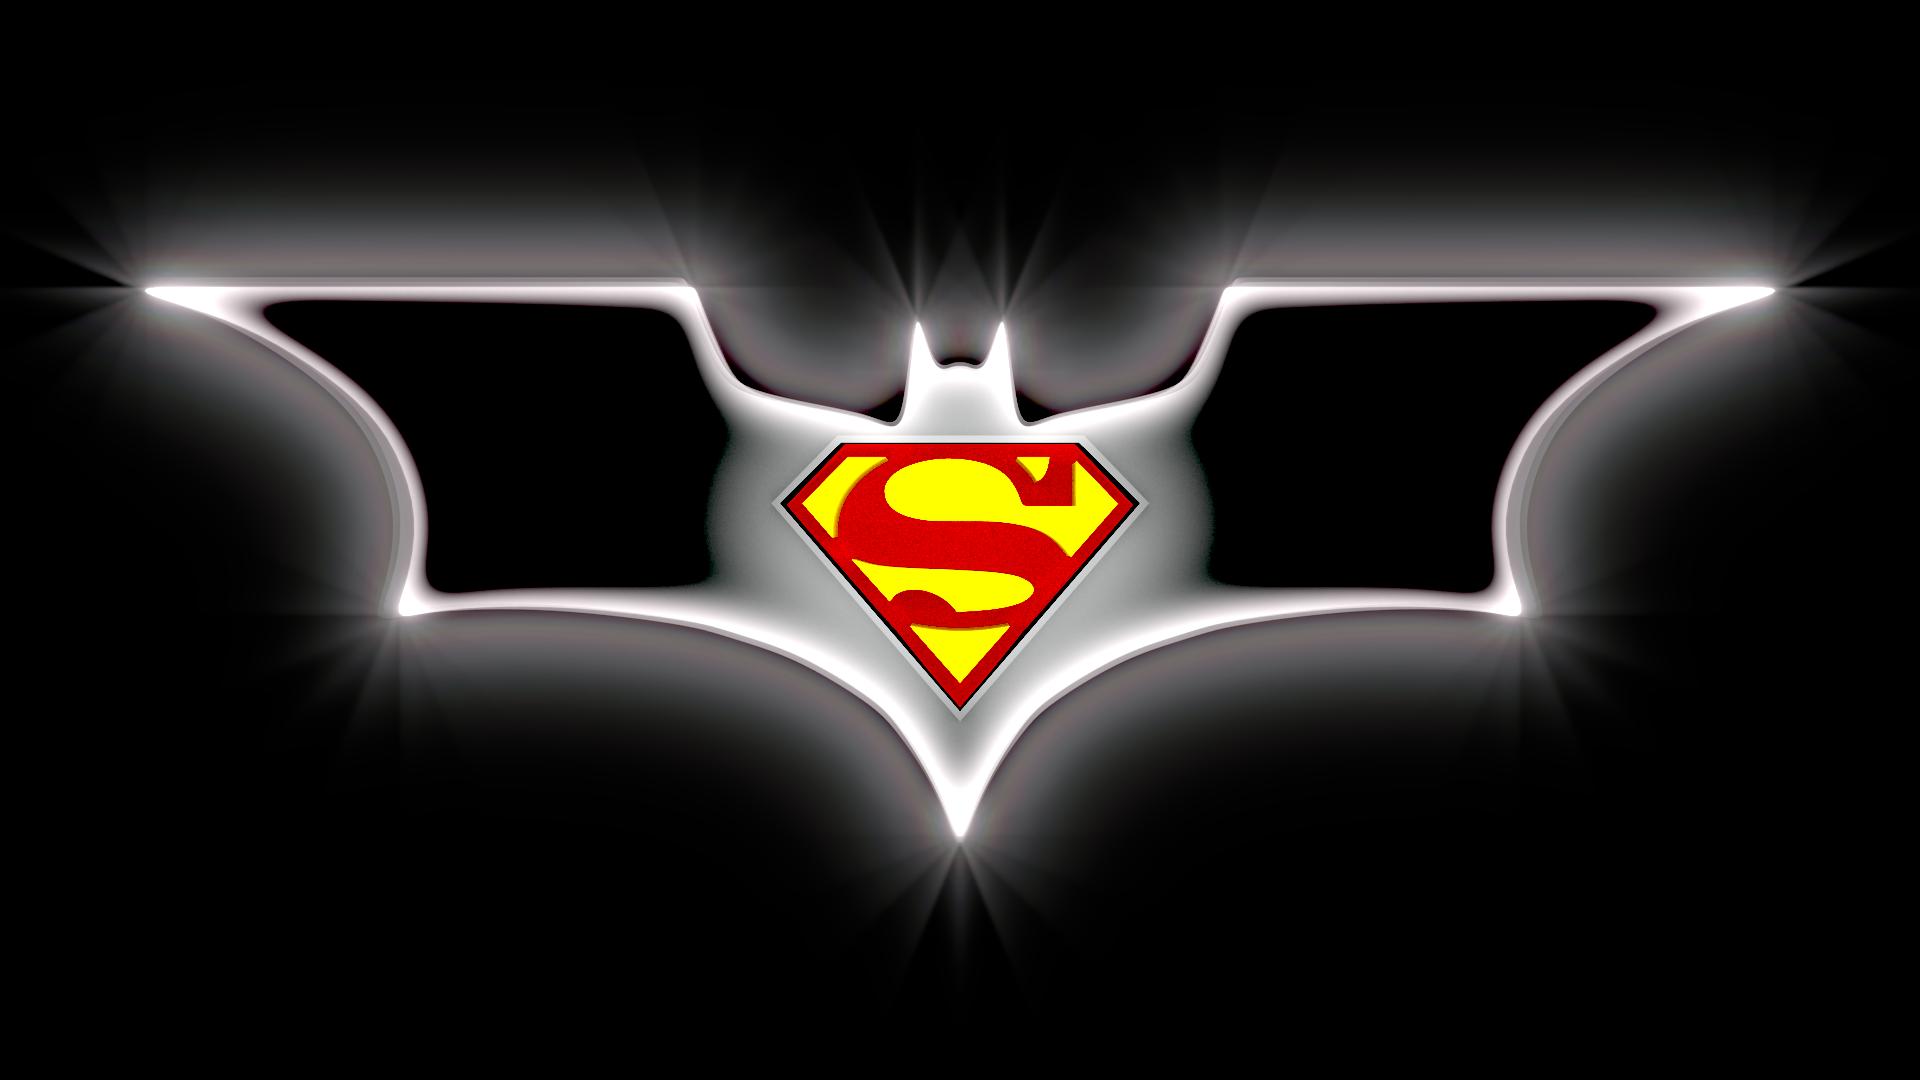 batman superman logo car interior design